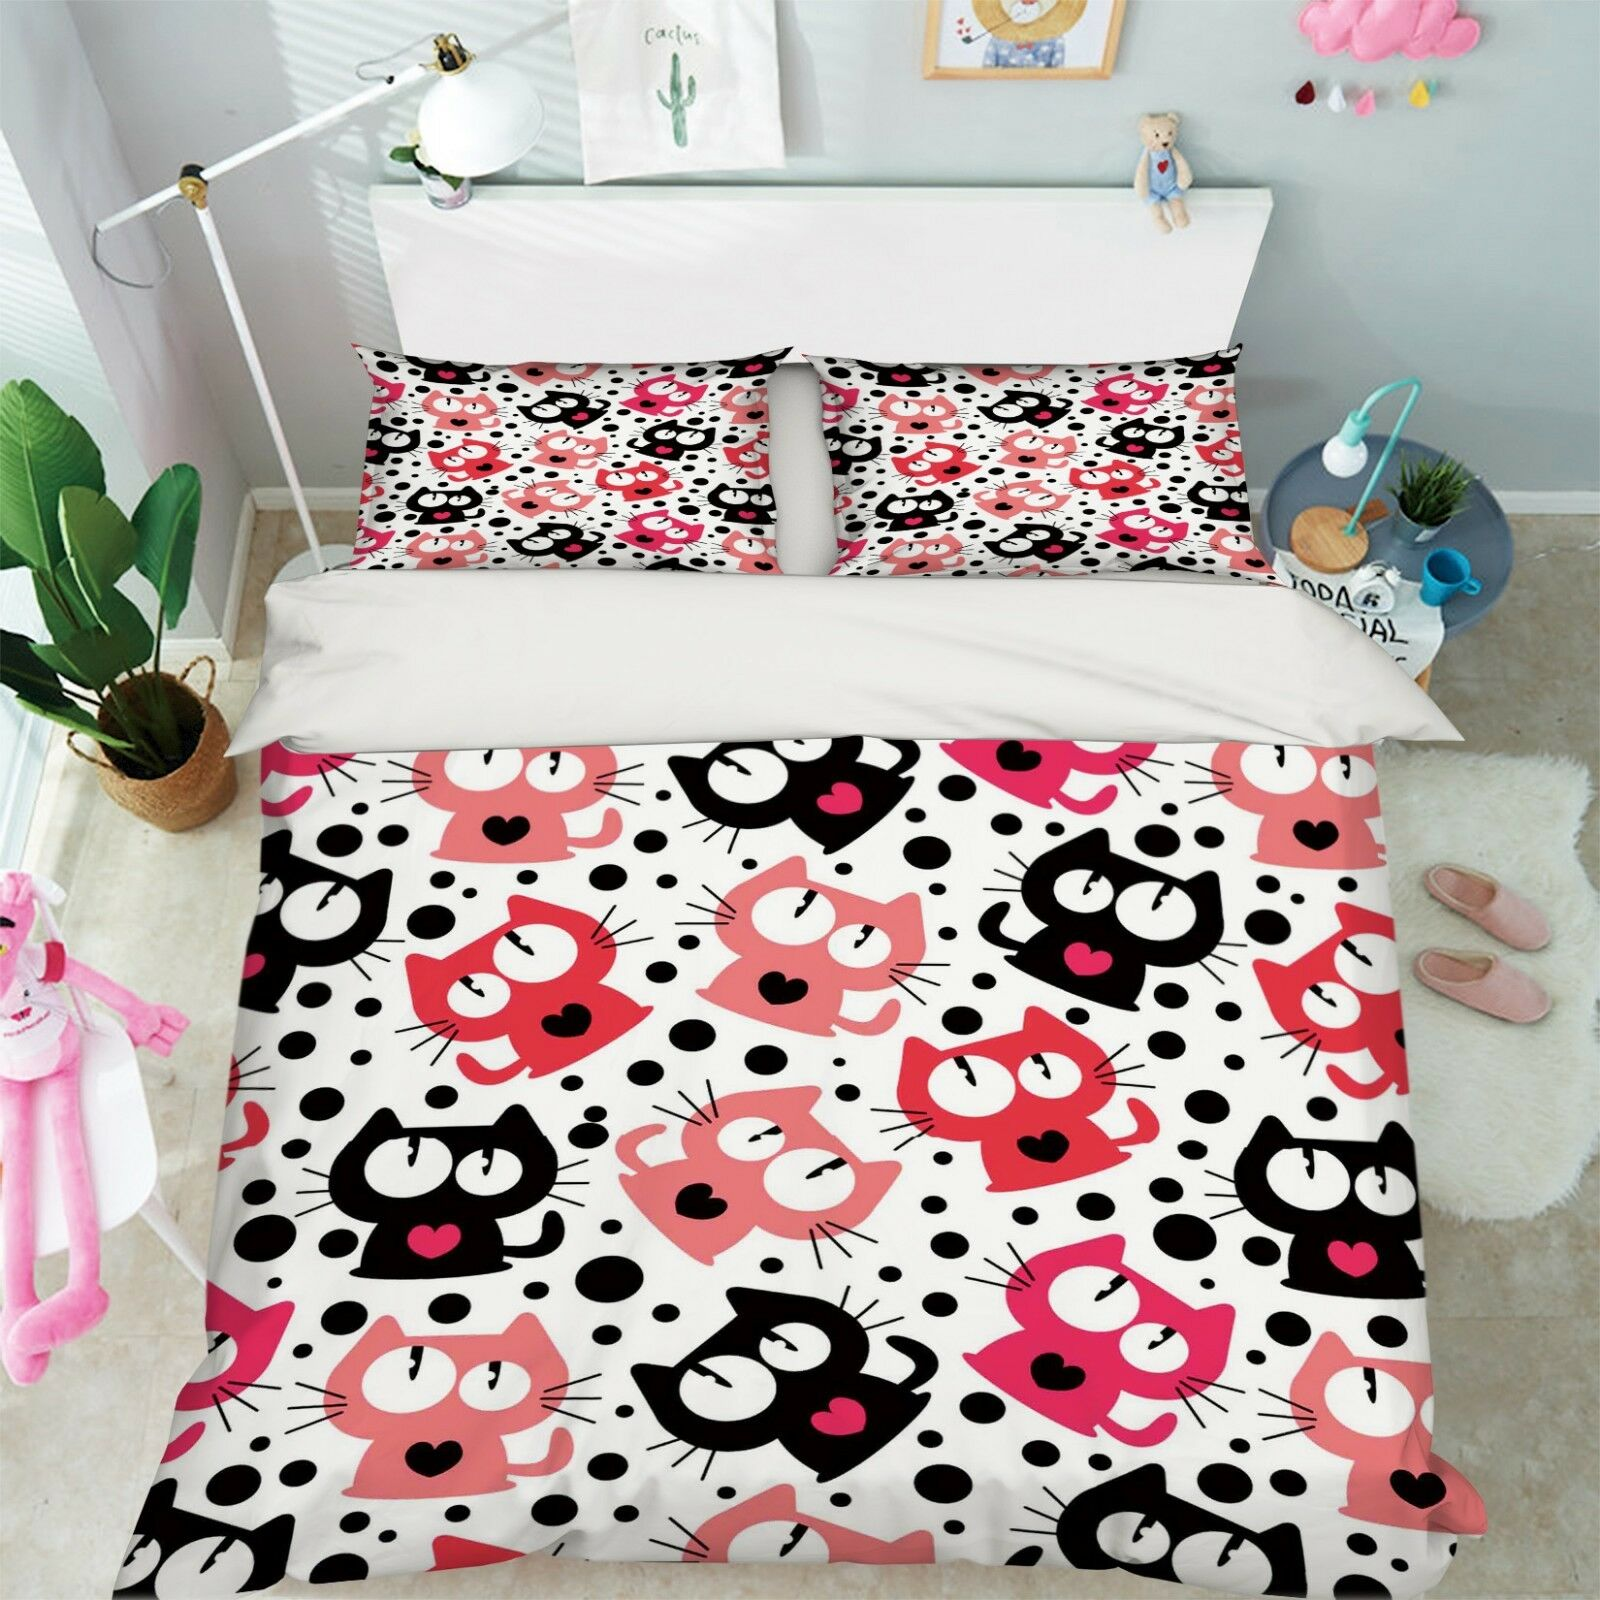 3D Cartoon Cat 577 Bed Pillowcases Quilt Duvet Cover Set Single Queen AU Carly